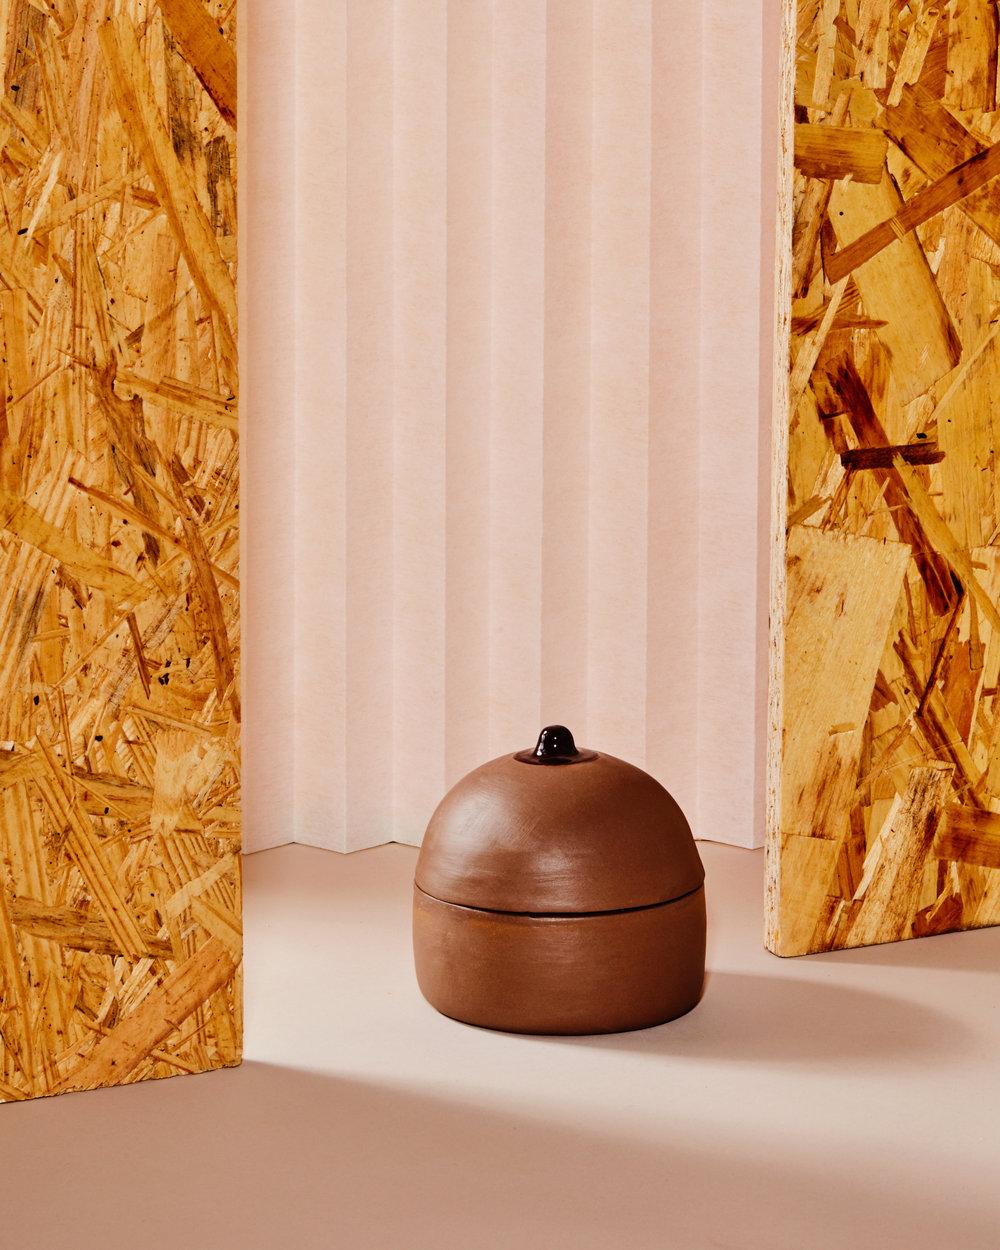 29072018-Wolfgang-Ceramics-5470-copy.jpg